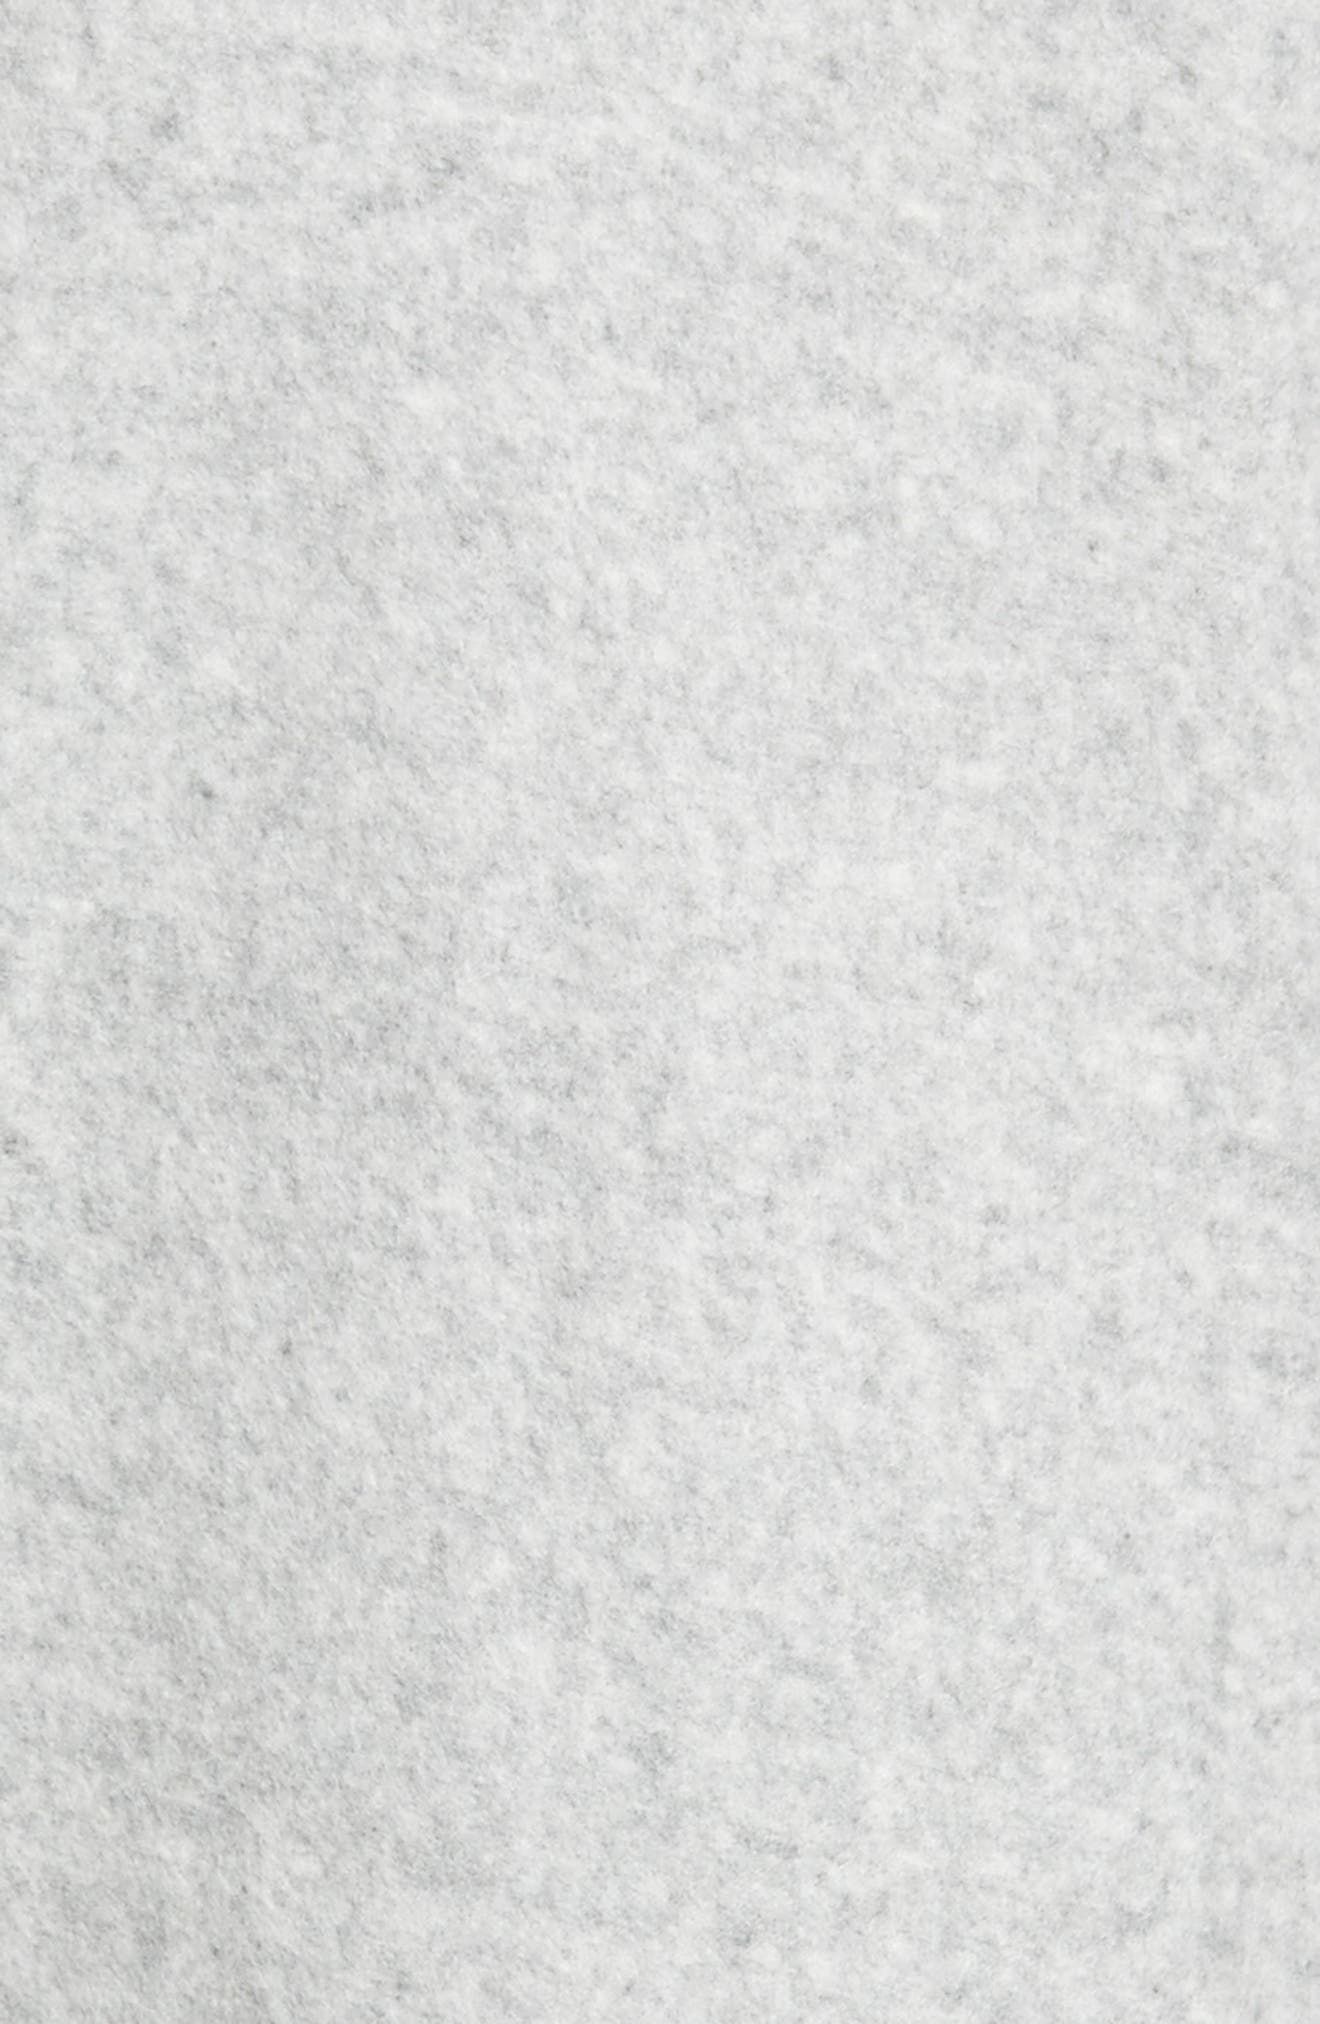 Bell Sleeve Sweatshirt,                             Alternate thumbnail 5, color,                             020